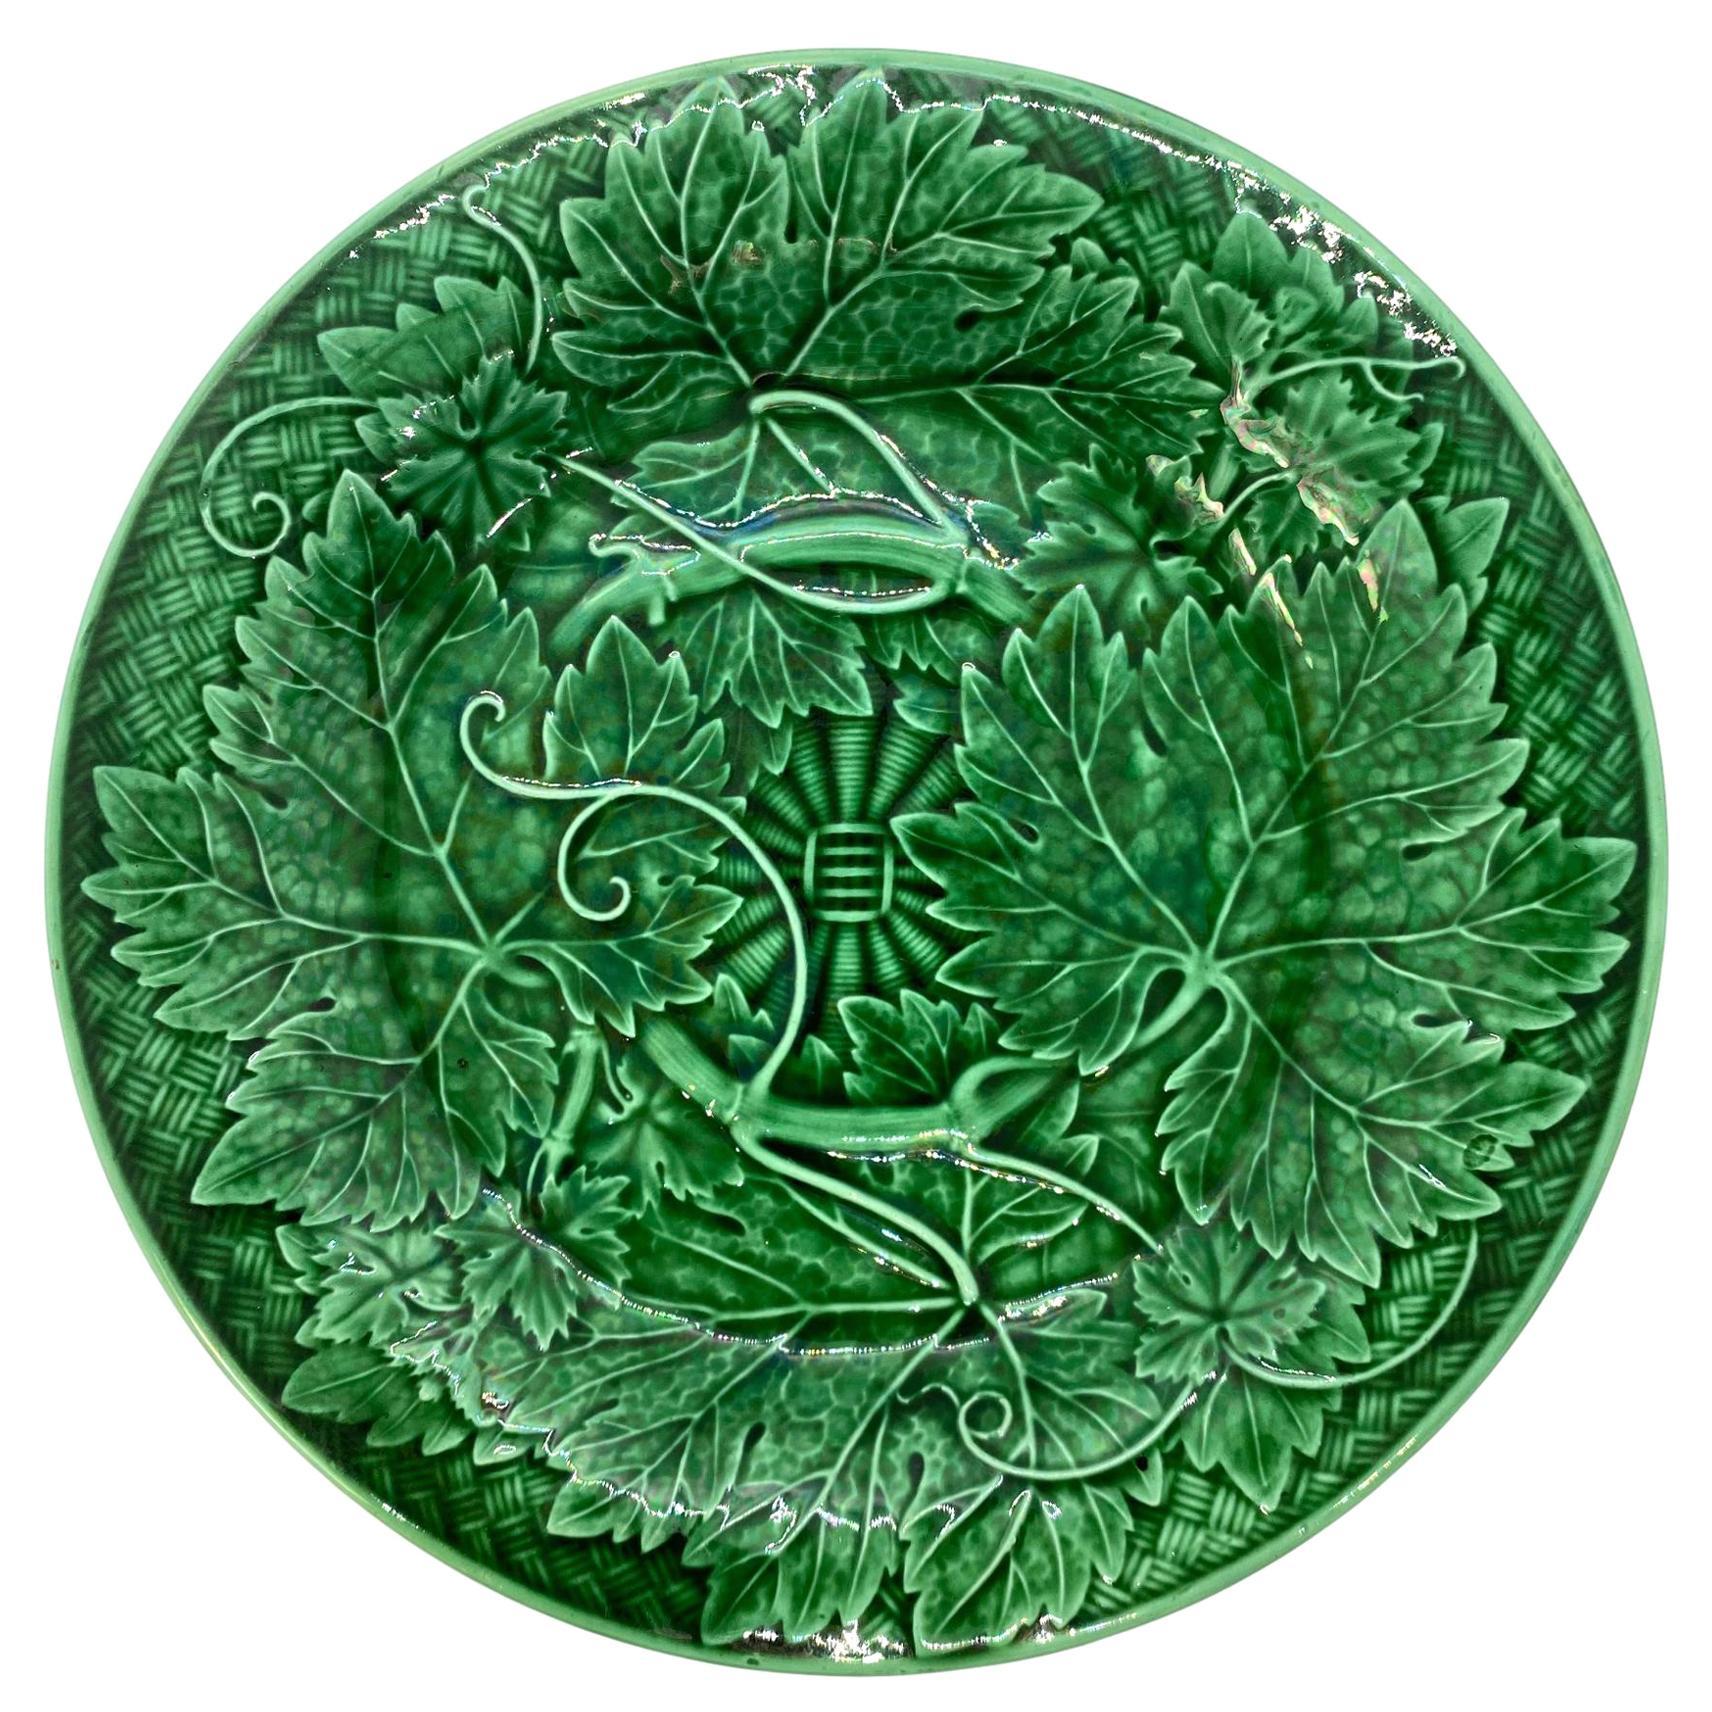 Wedgwood Majolica Green Glazed Basket Weave Plate, English, Dated 1894